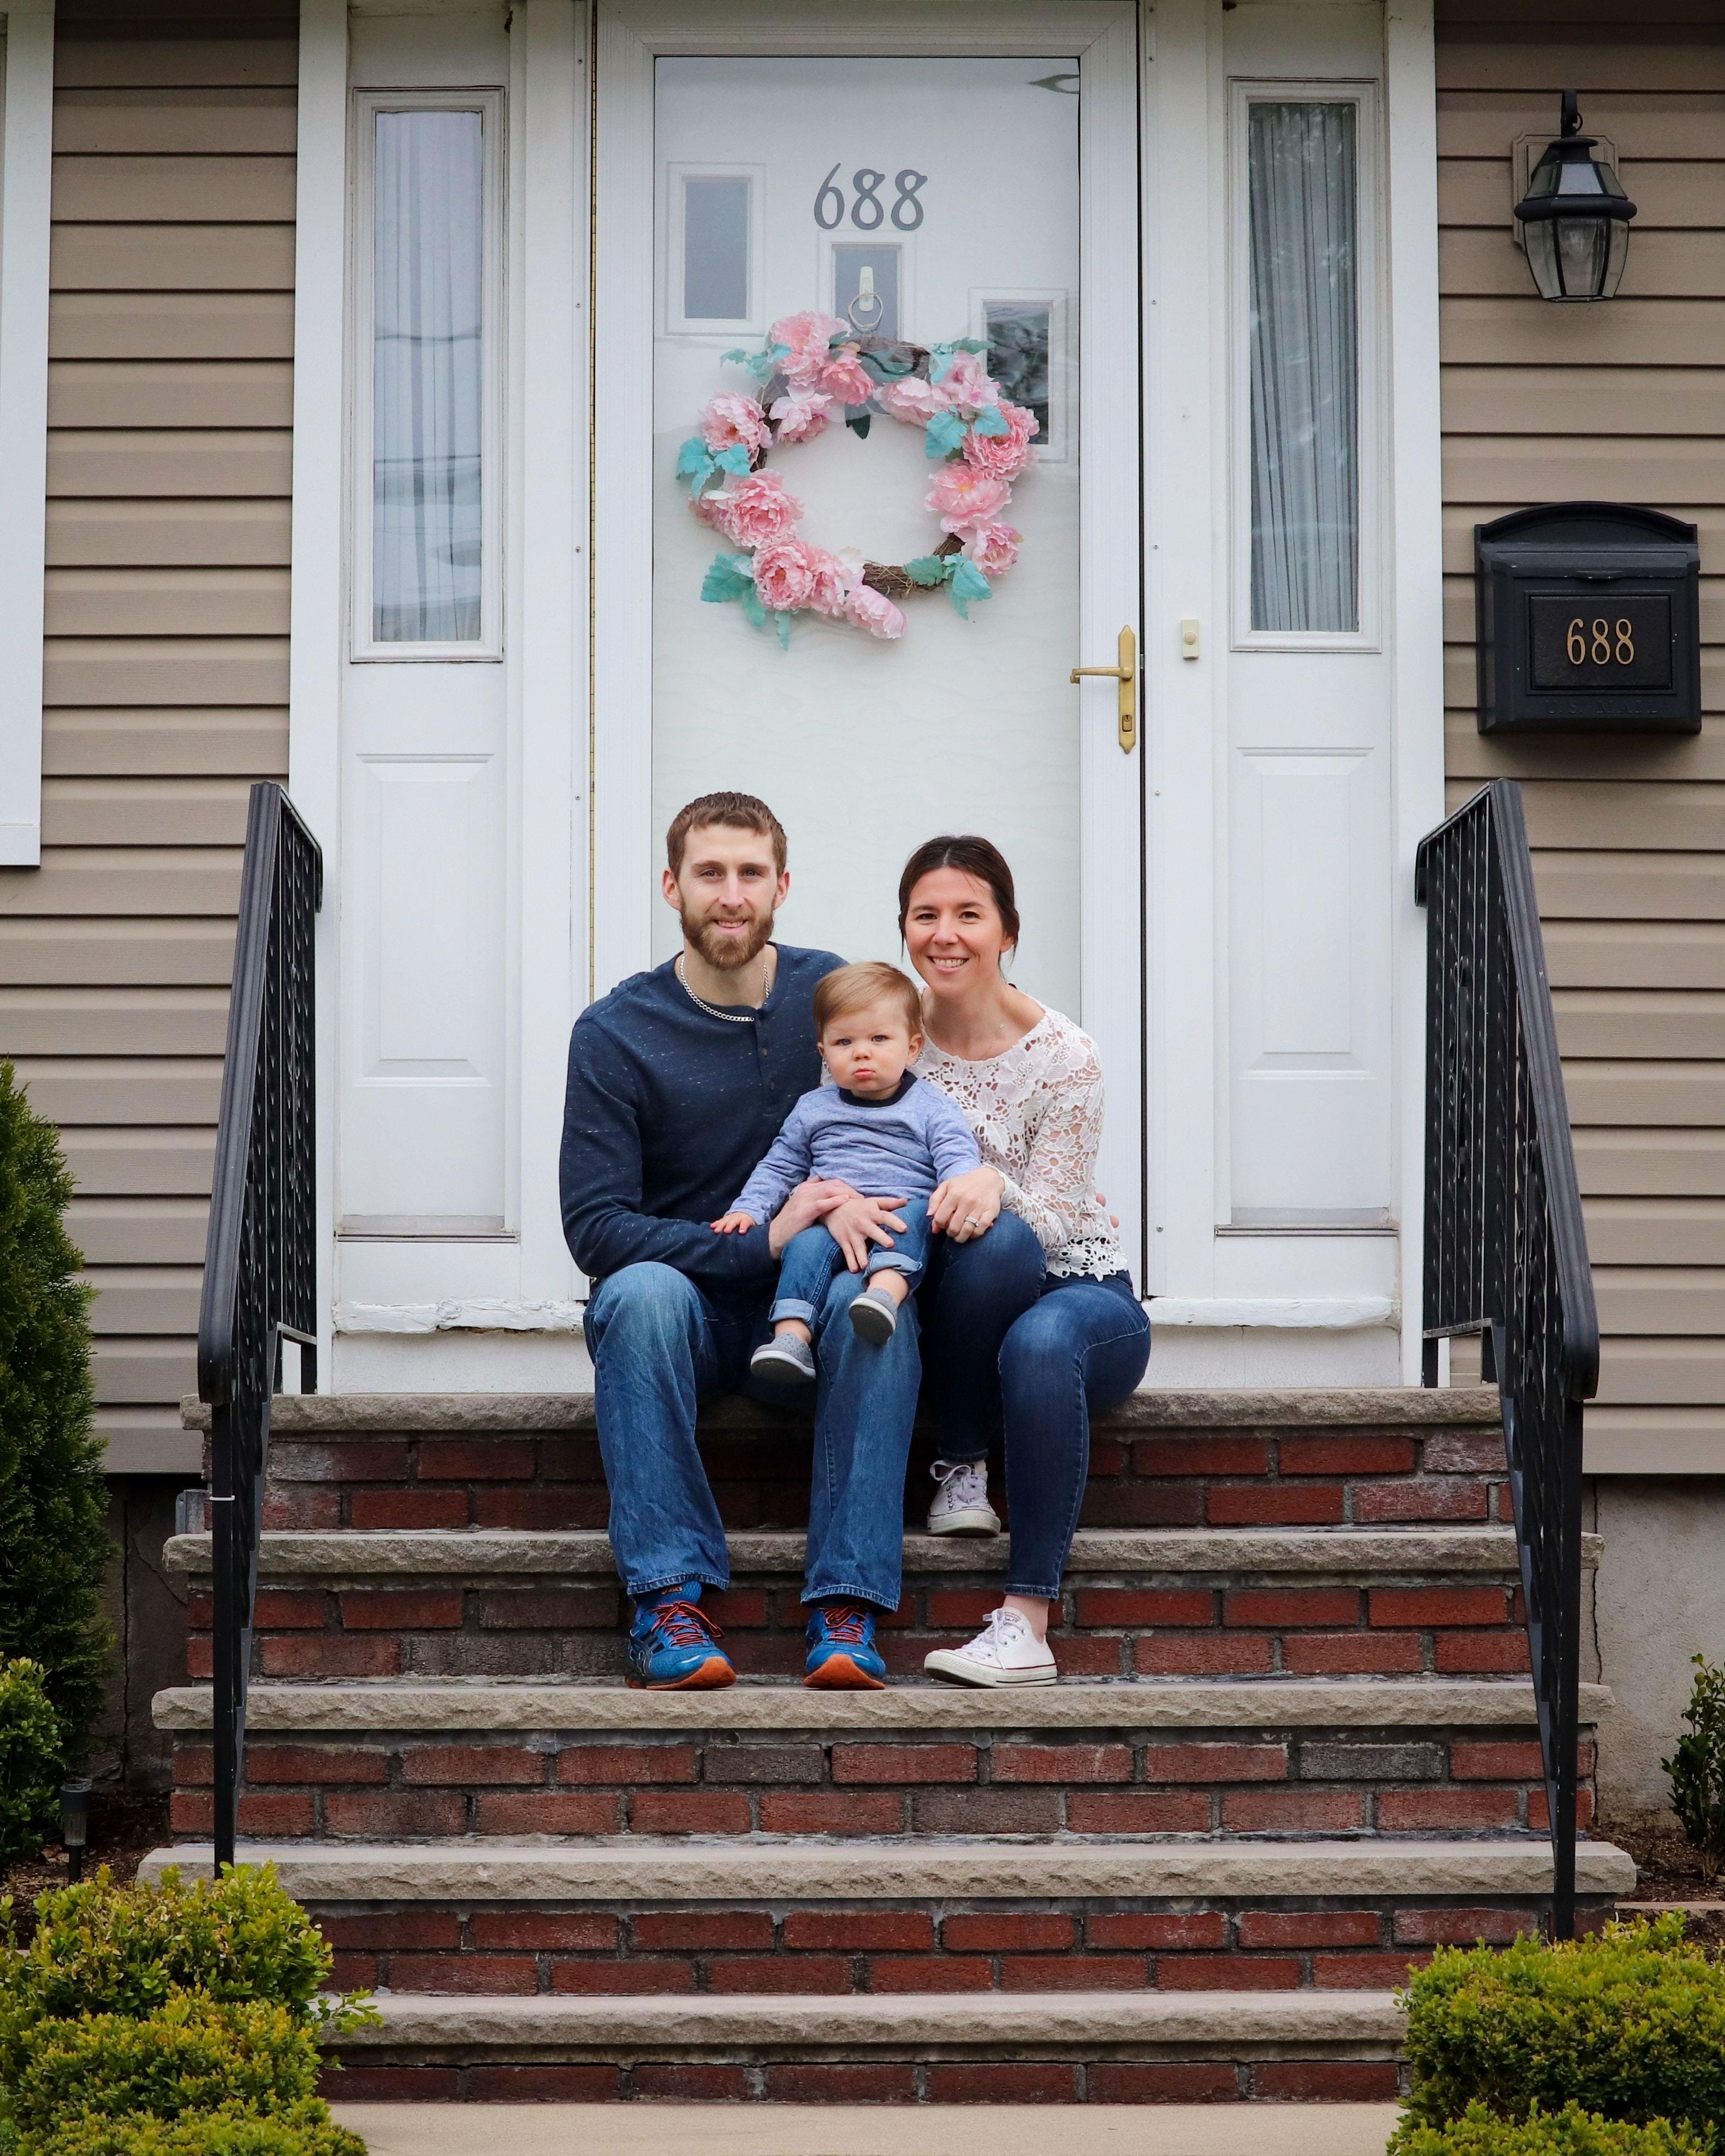 Homebuyer Program Information Session (FREE)